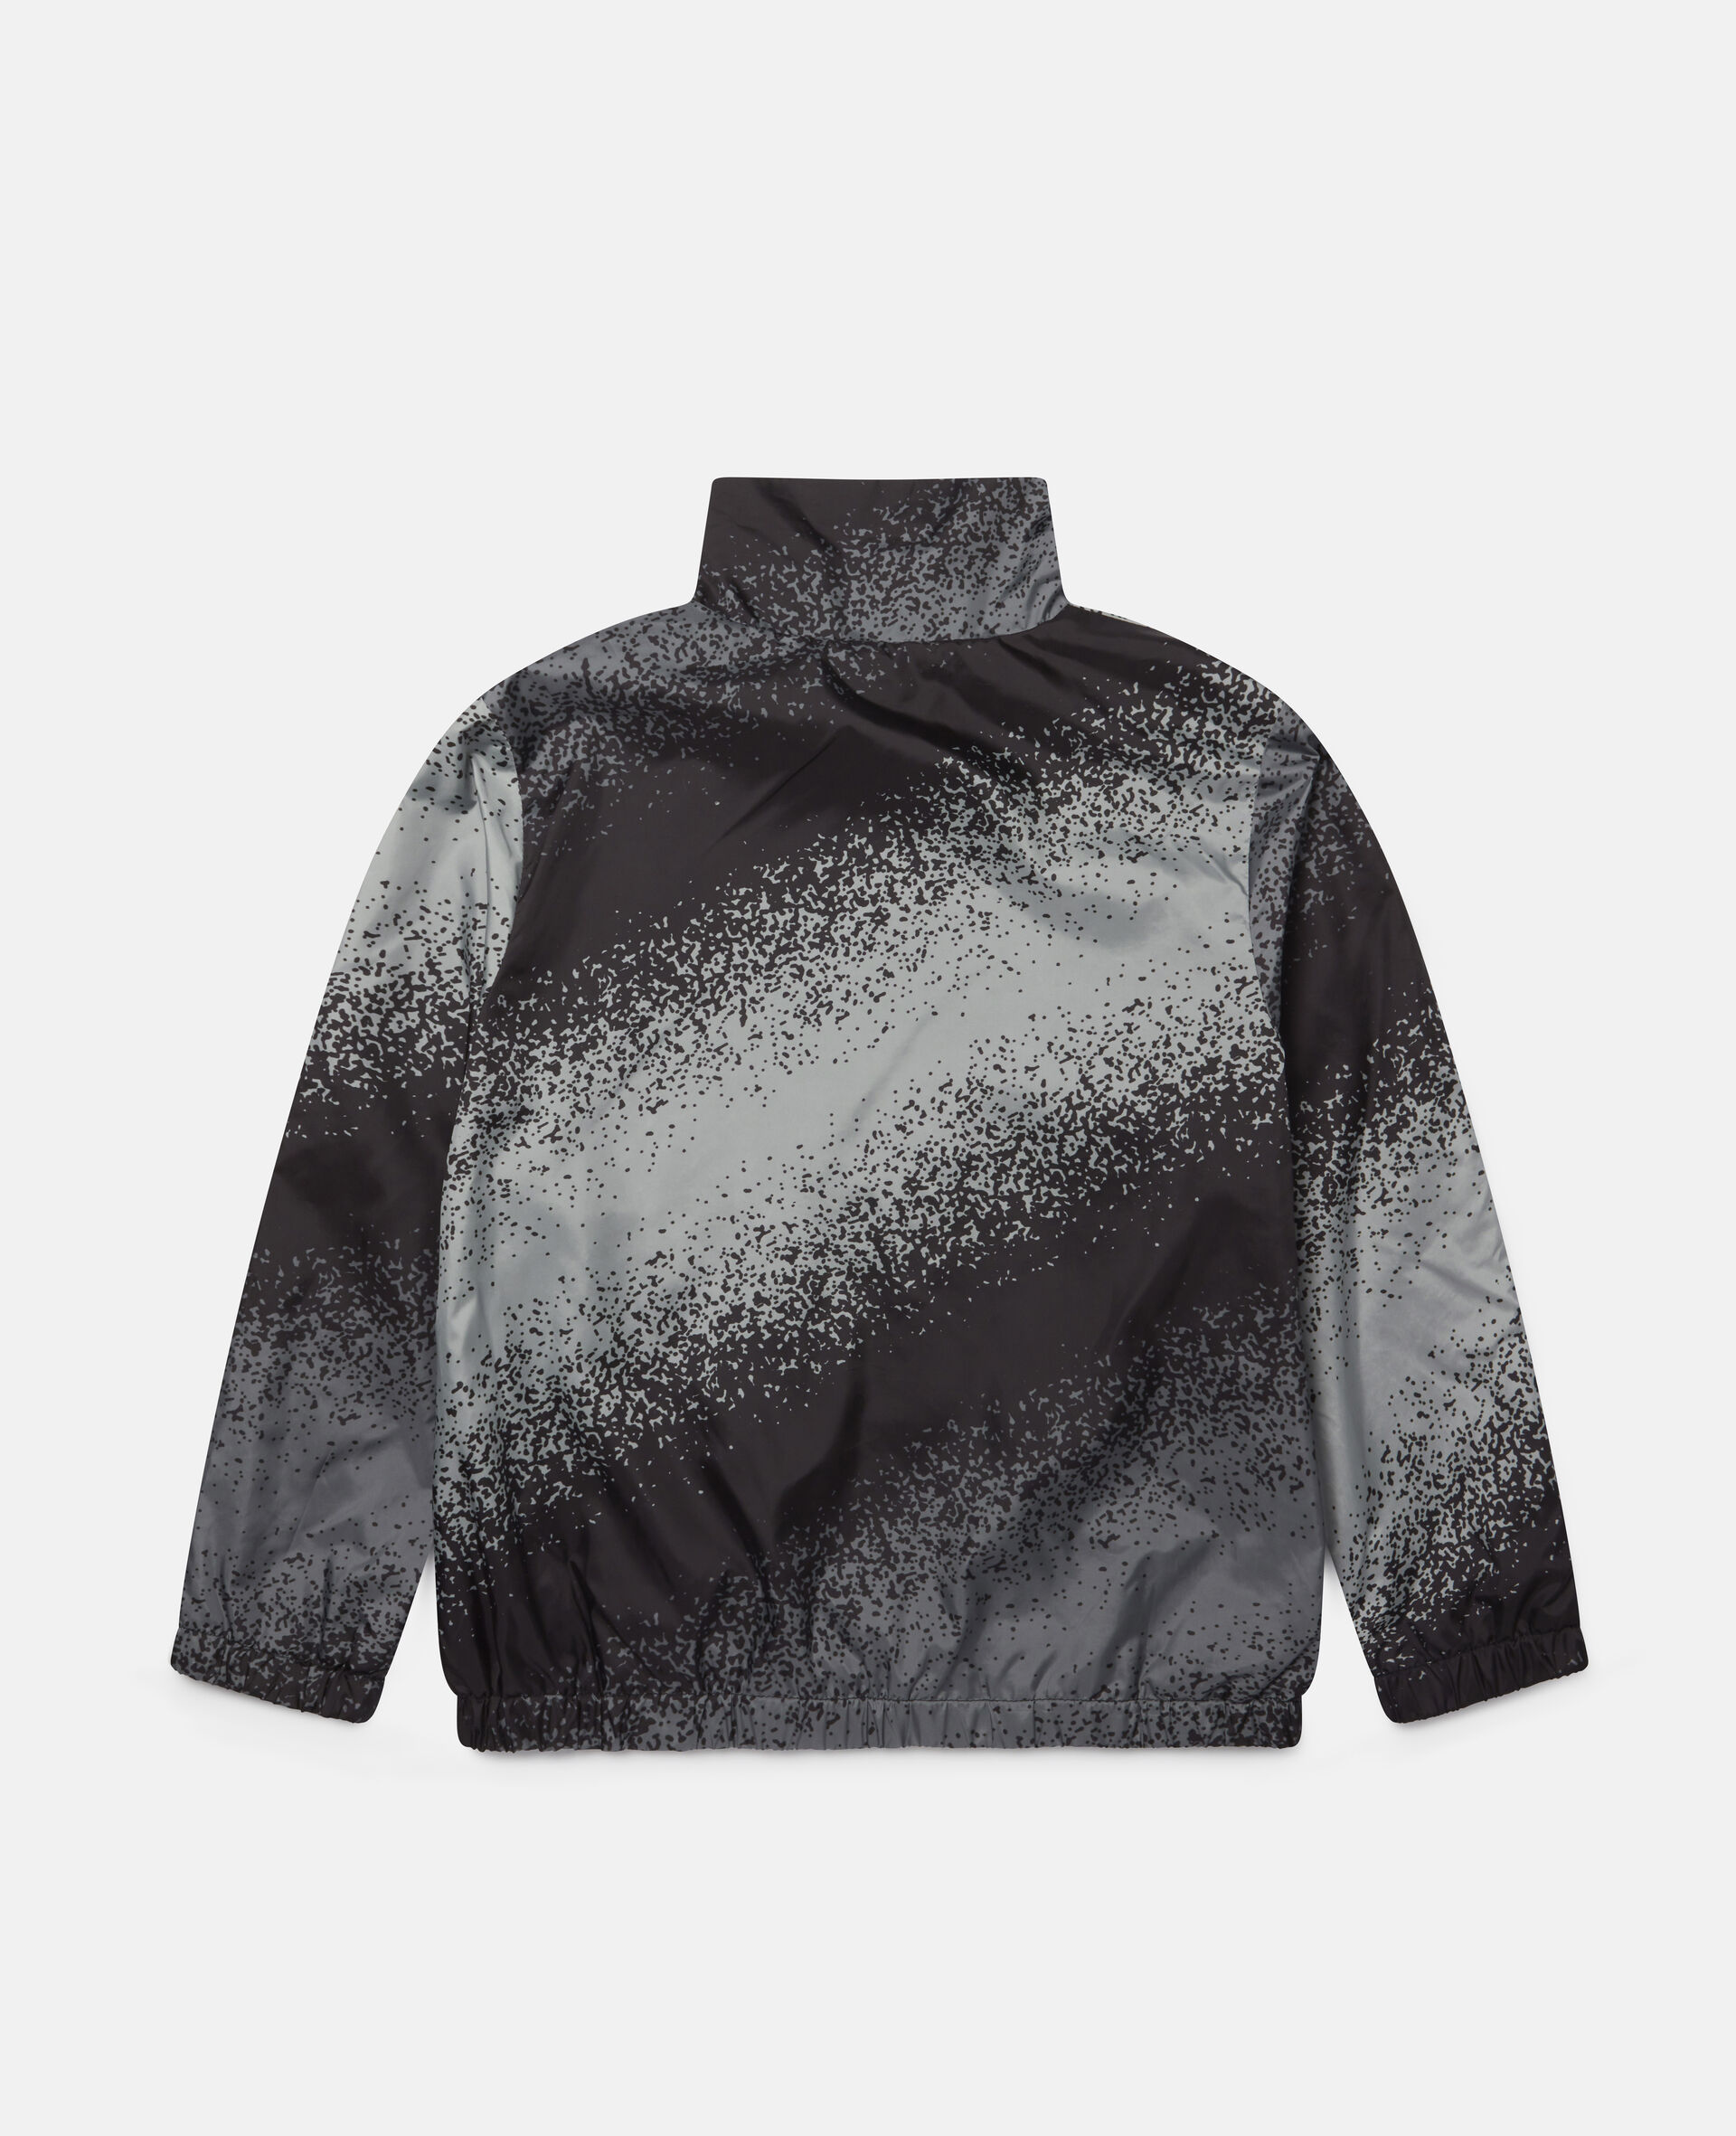 Spray Painted Effect Jacket-Grey-large image number 3